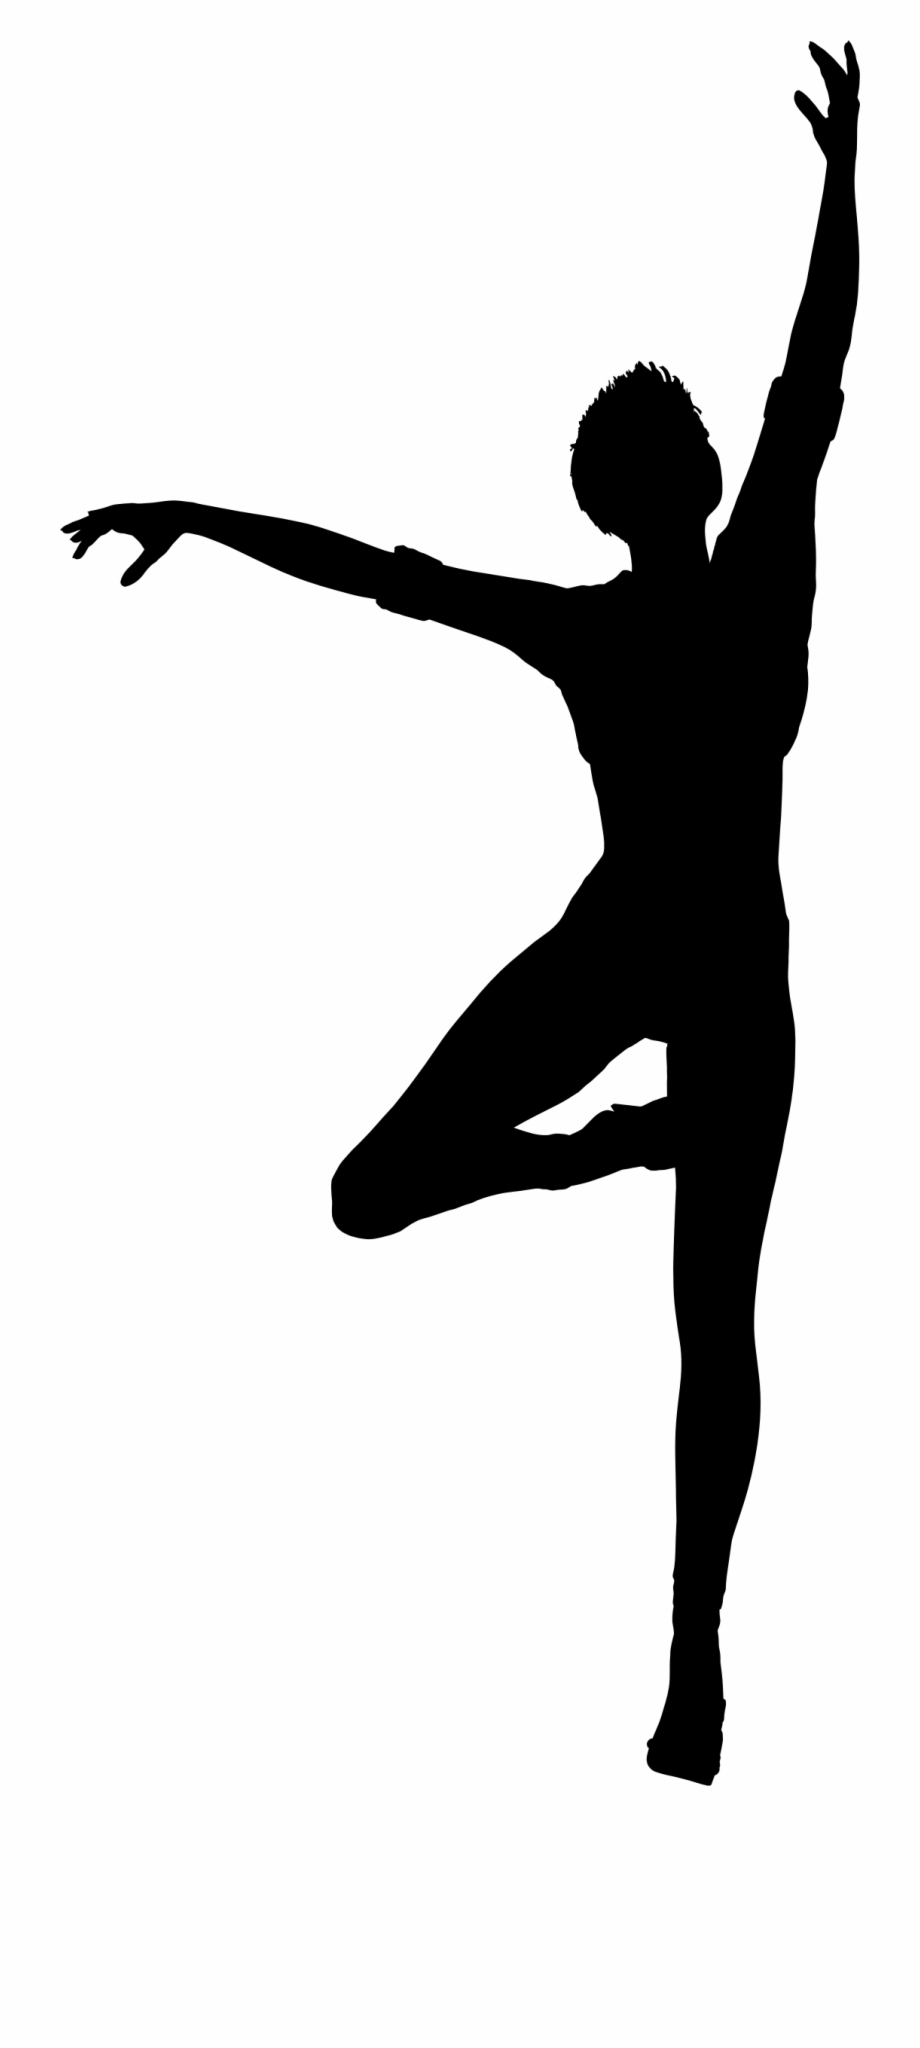 Silhouette dance clipart graphic transparent download Girl Dancing Png Silhouette - Dancing Woman Silhouette Free ... graphic transparent download